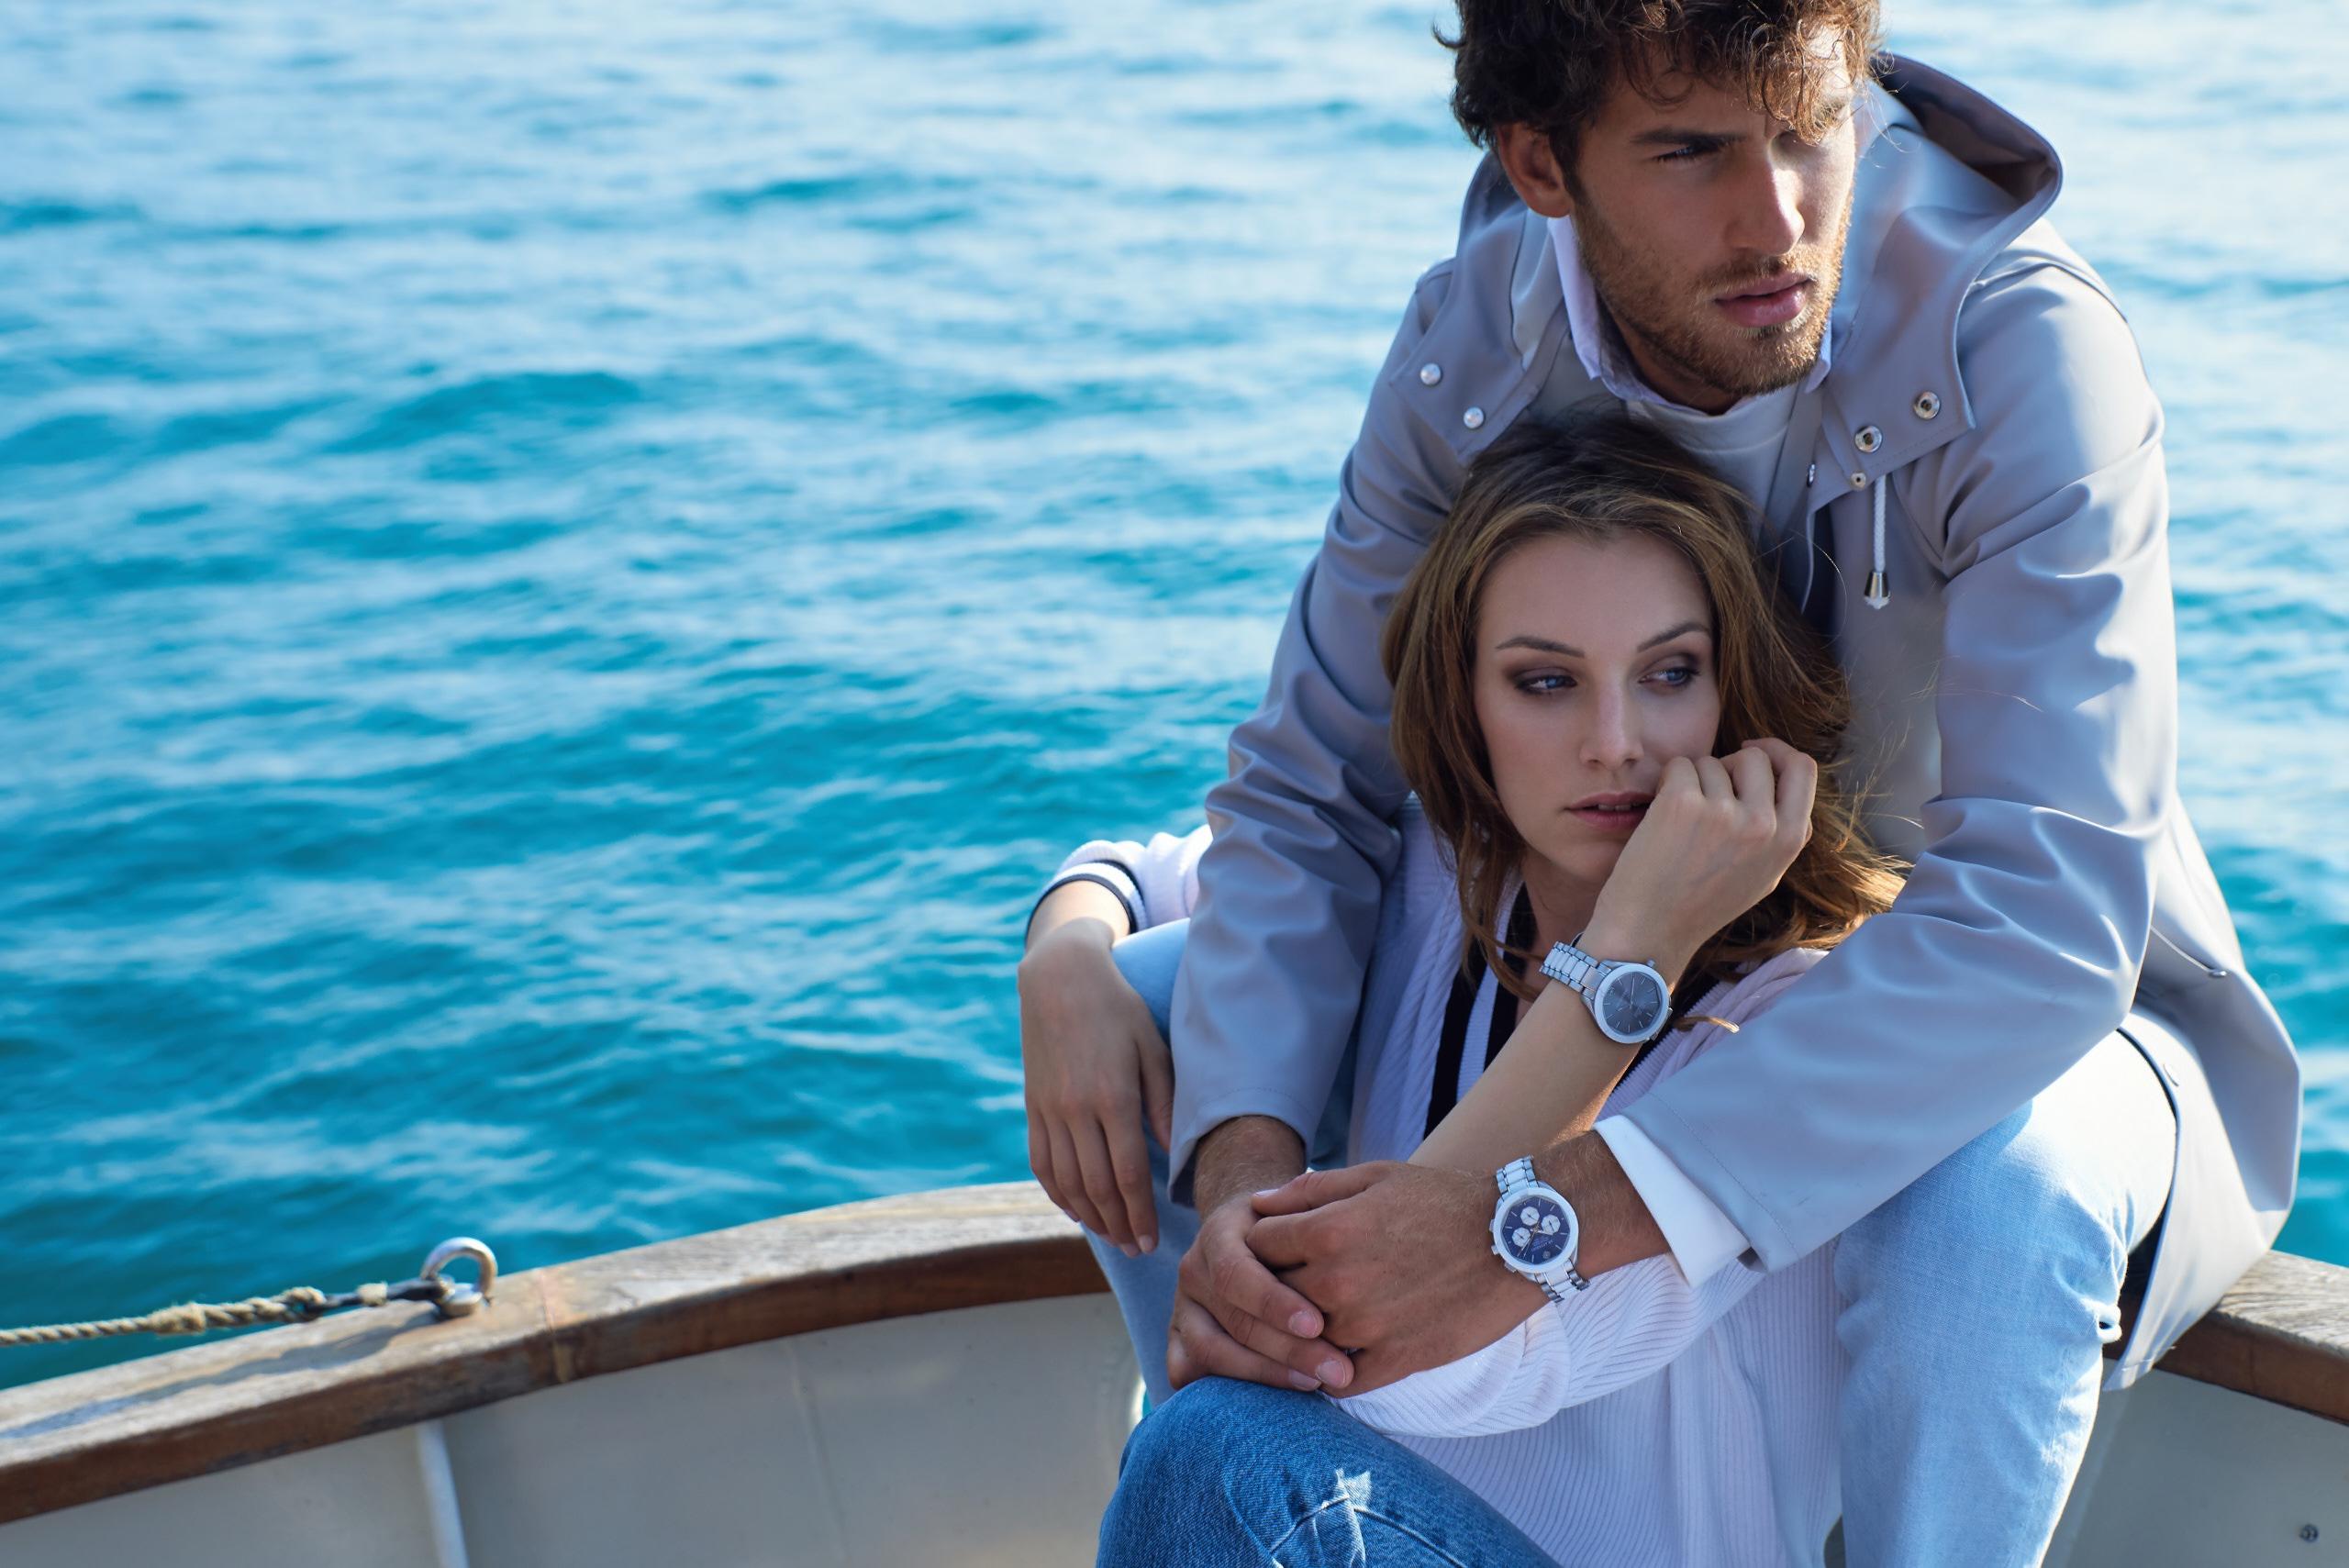 francesca_babbi_watch_orologio_adv_veron